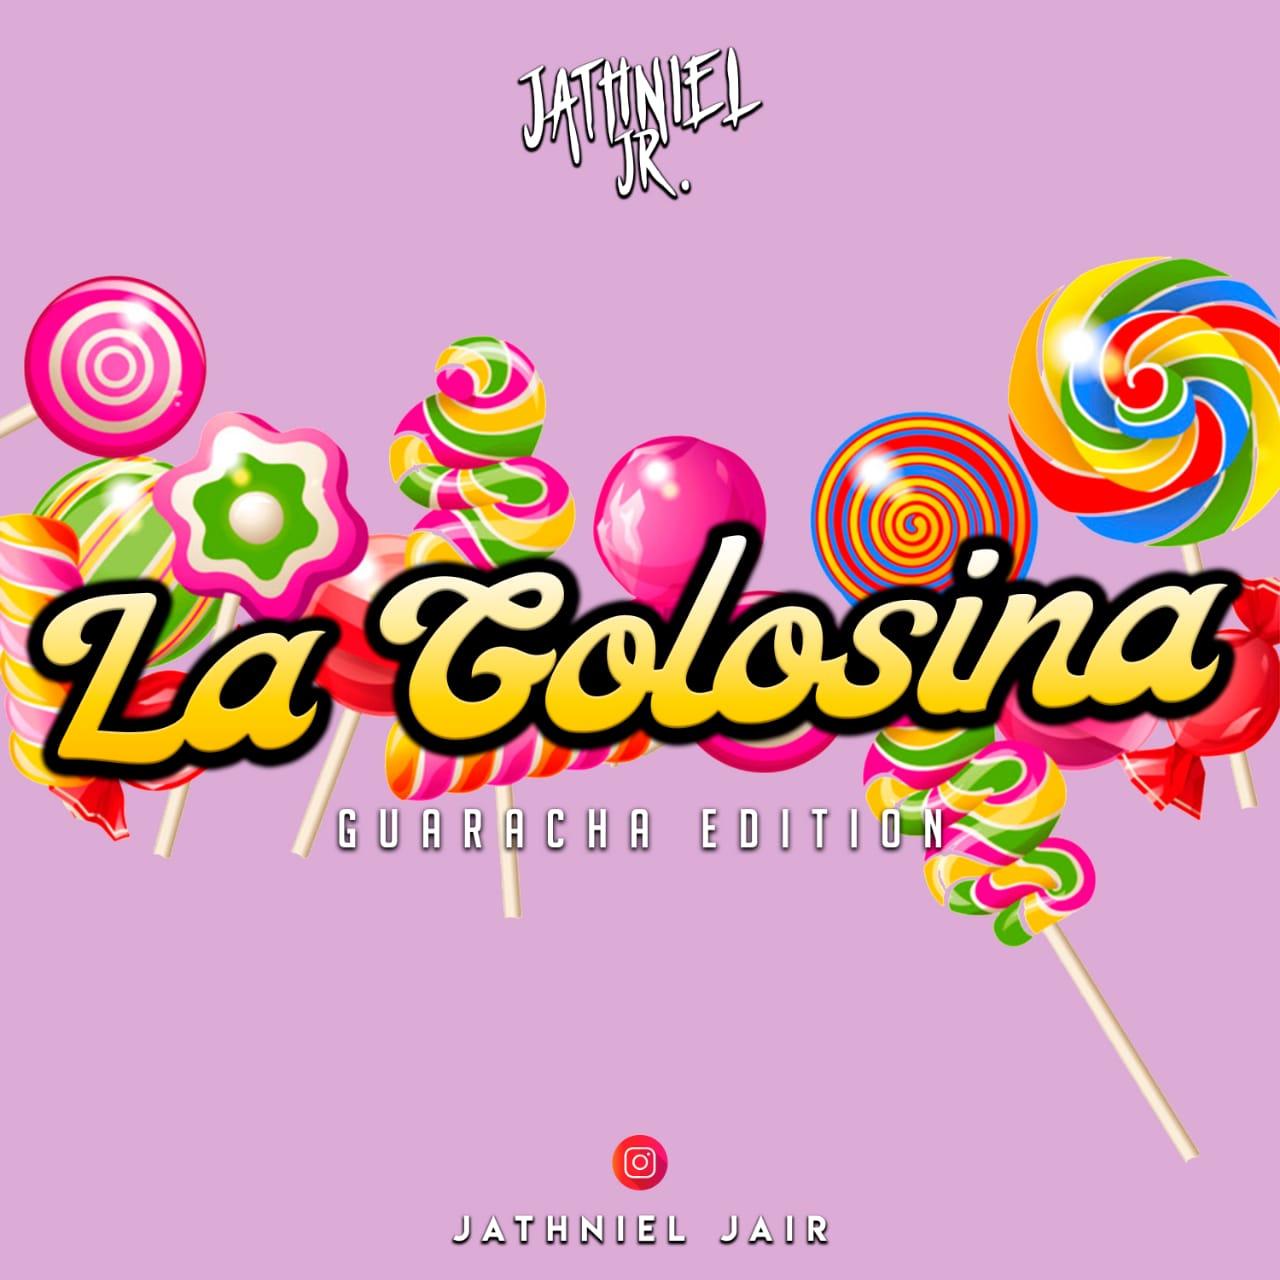 Dj Jathniel Jr - La Golosina The Mixtape (Guaracha Edition)